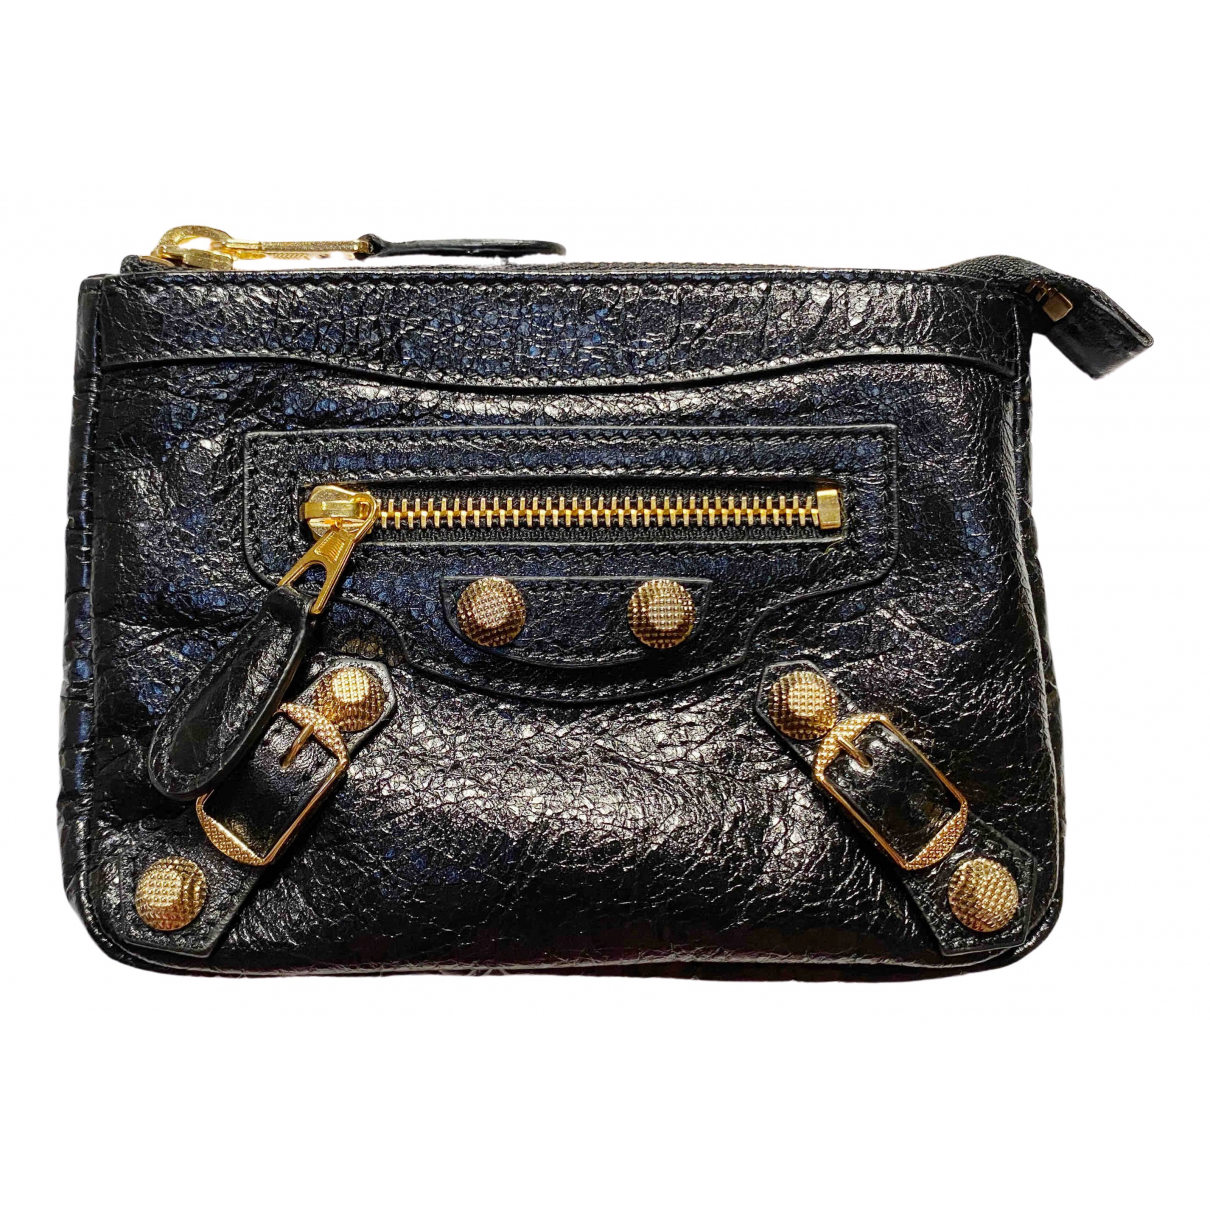 Balenciaga \N Black Leather Purses, wallet & cases for Women \N